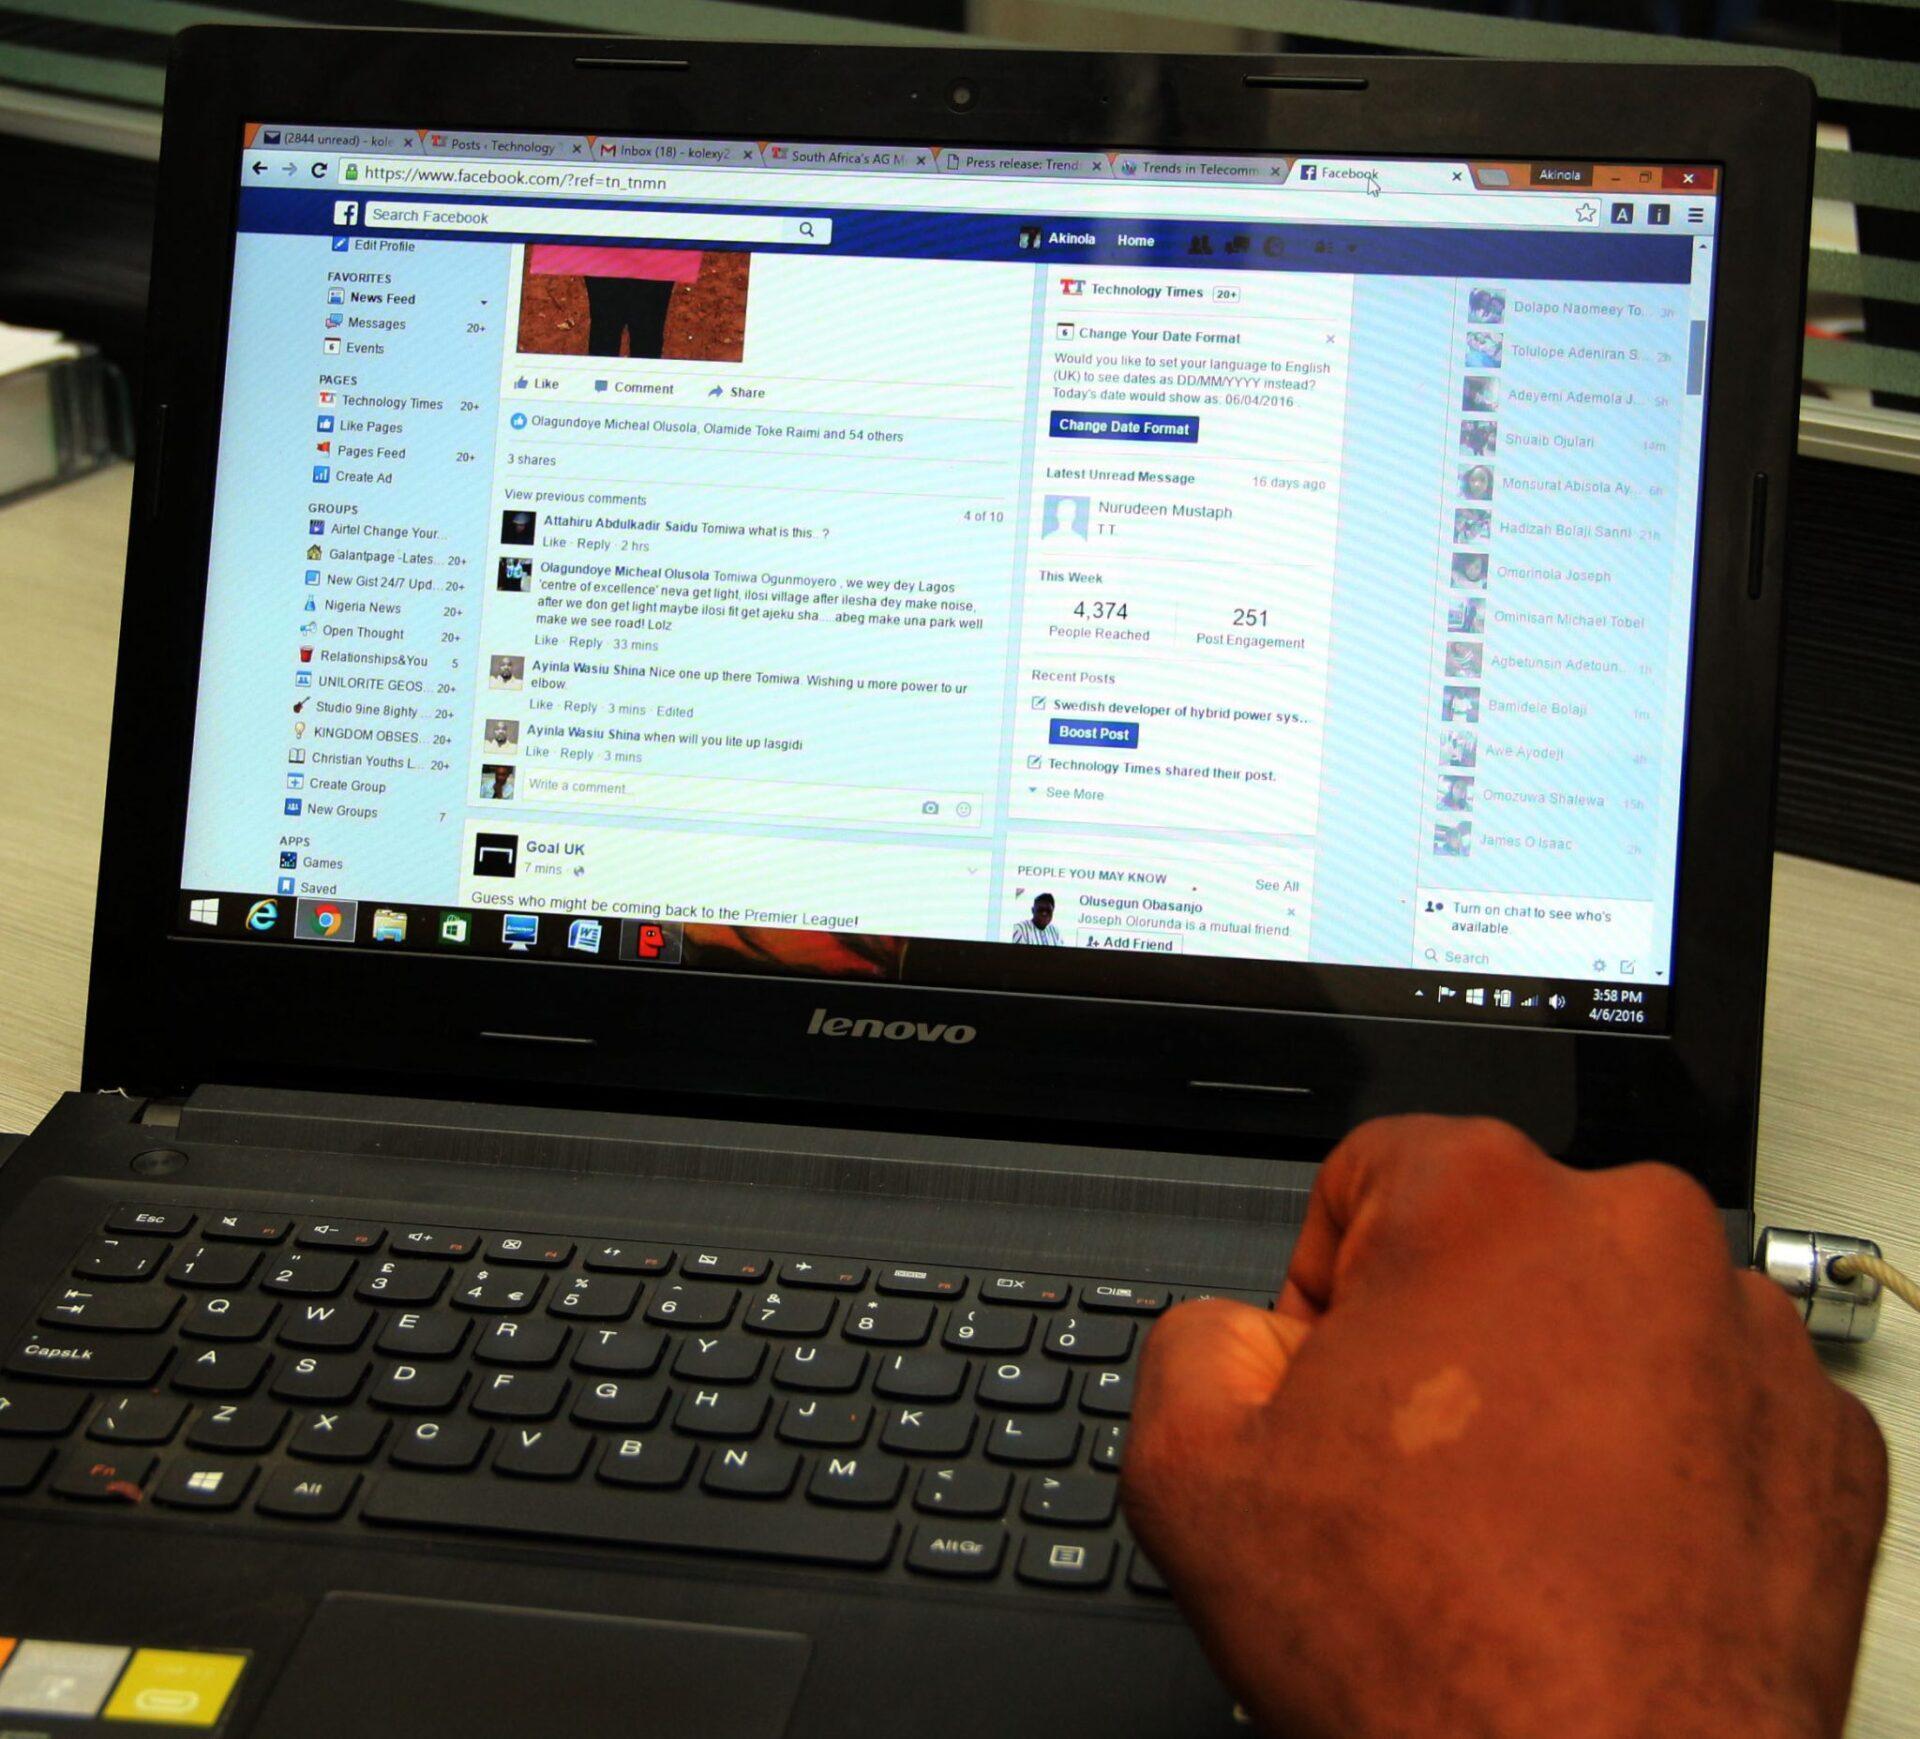 Facebook Live Chat goes live